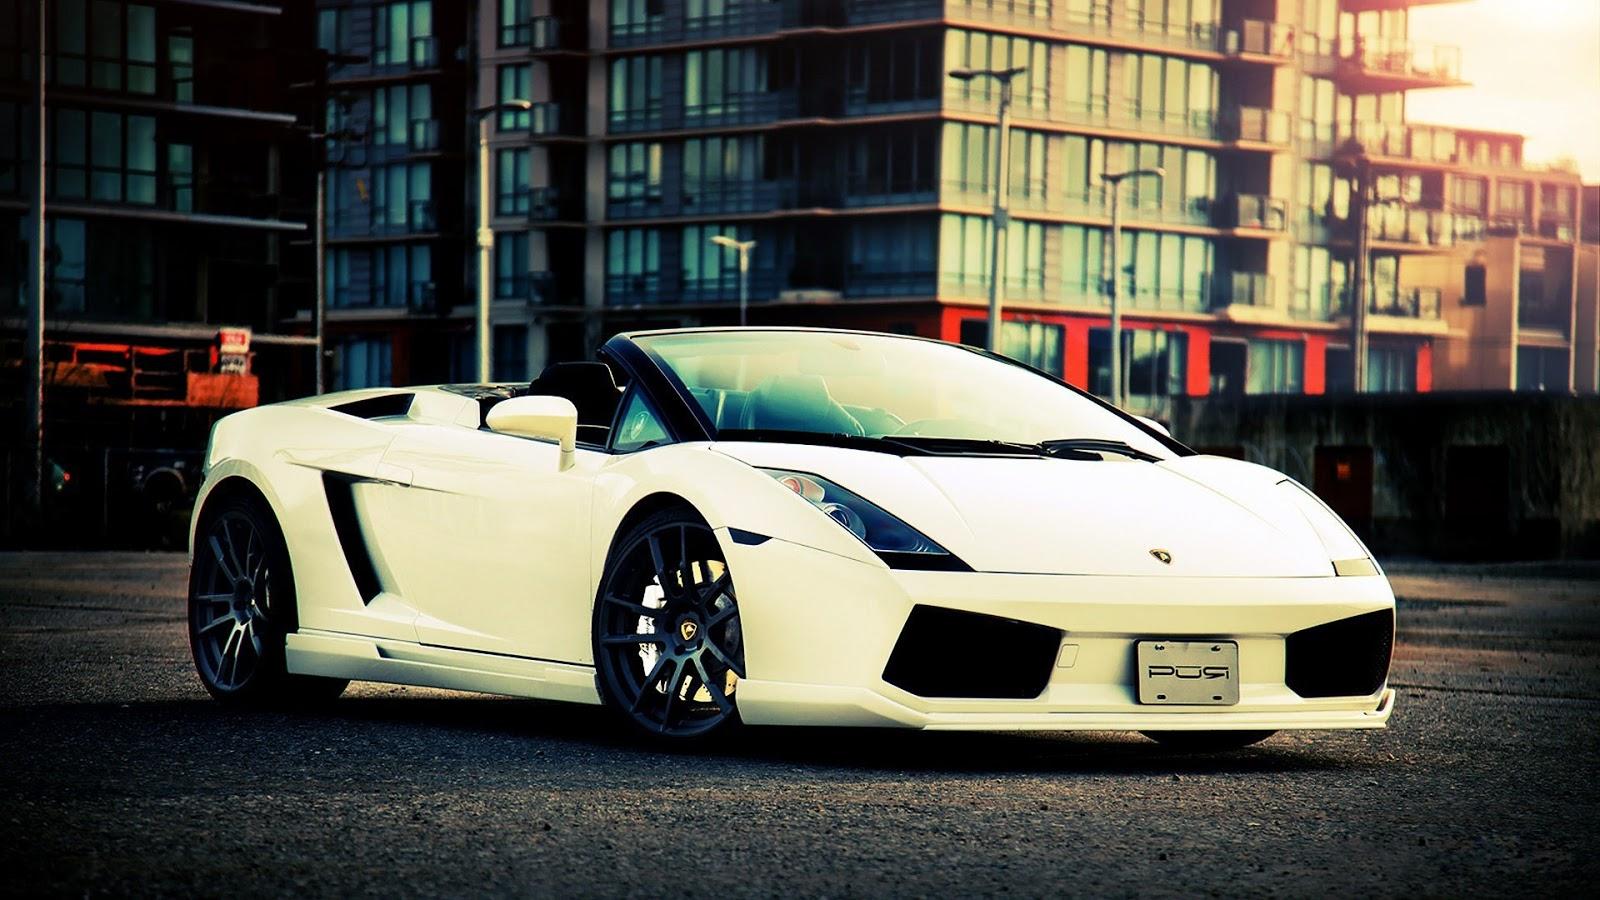 Lamborghini Awesome Car HD Wallpaper